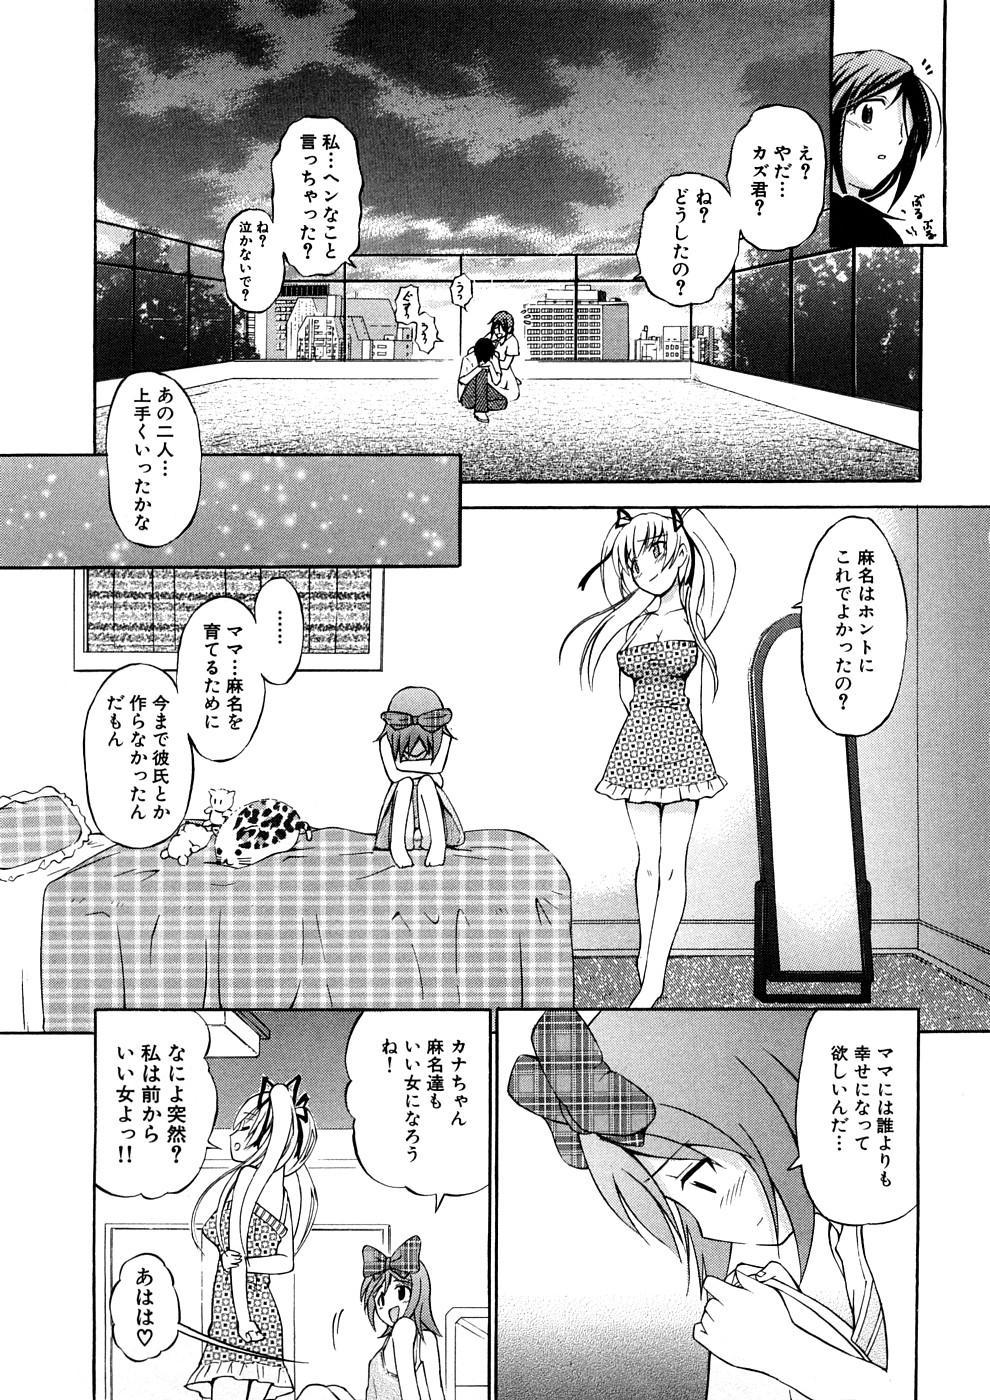 Geki Yaba Anthology Vol. 1 - Naka ni Dashite yo 25